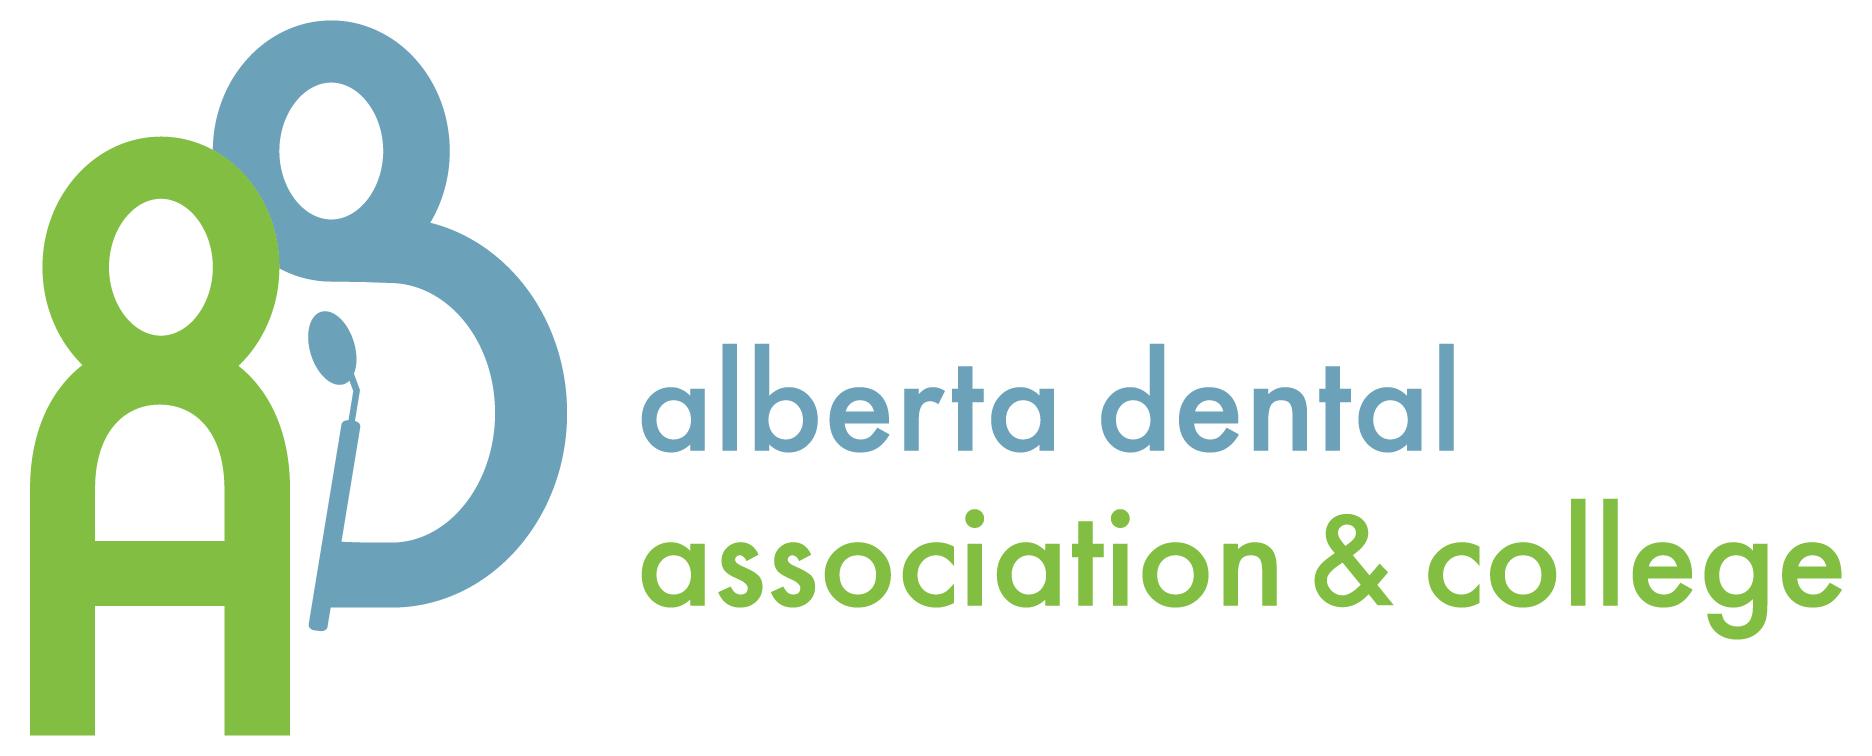 Alberta Dental Association & College